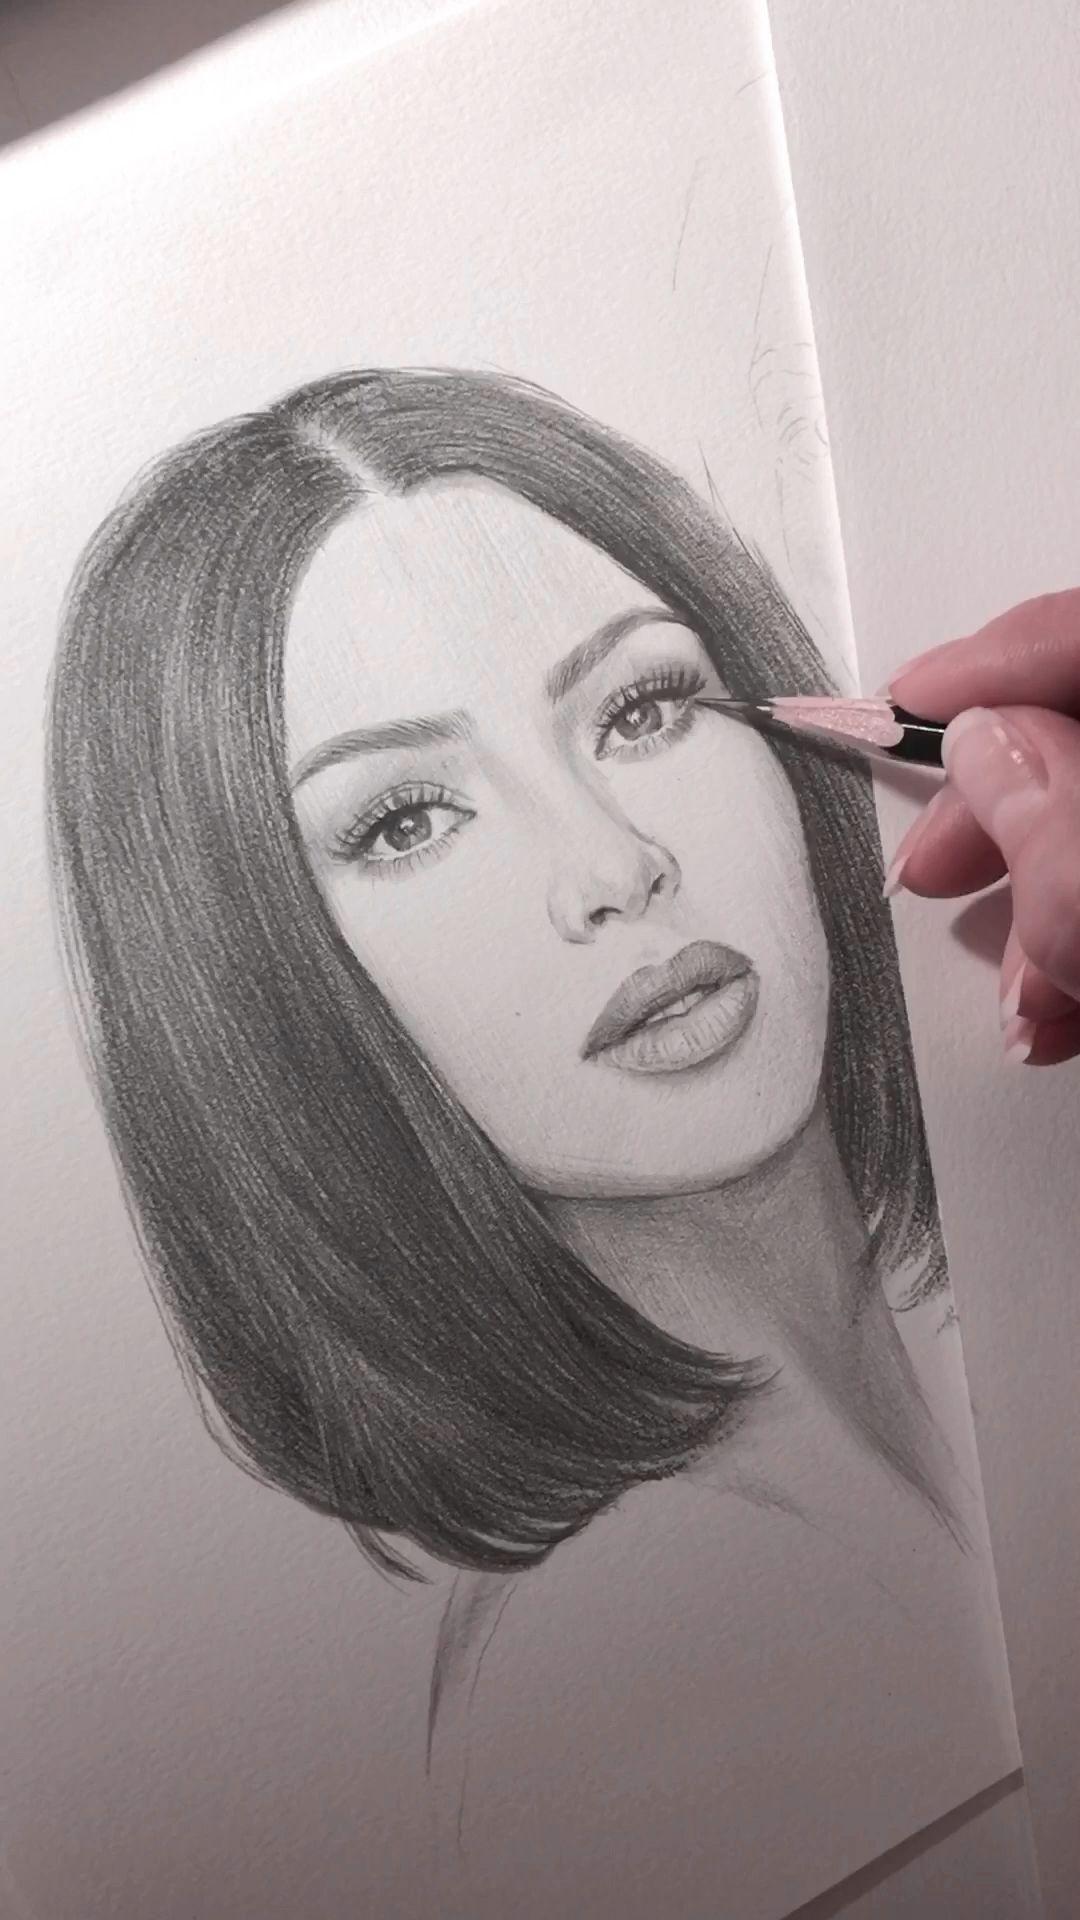 Pencil portrait of Kim Kardashian. -  The work is not finished yet, I'll give ... -  Pencil portrait of Kim Kardashian. –  The work is not finished yet, I'll give Kim a few more marks. Plus there's a younger sister awa – #FineArt #kardashian #Kim #OilPaintings